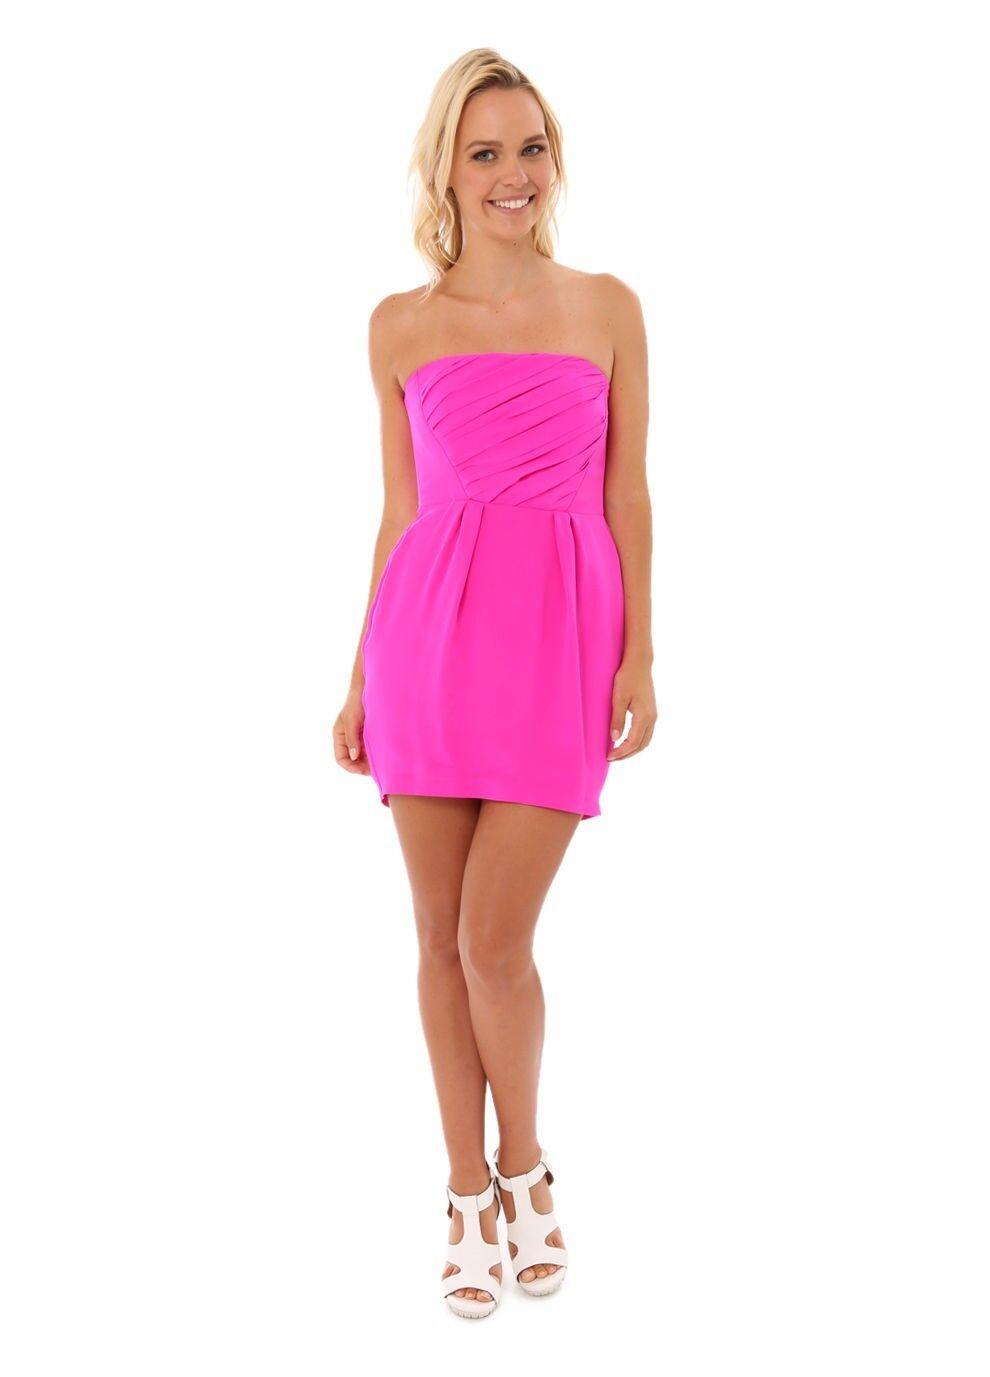 NAVEN Pink Foxy Shirred Silk Mini Strapless Dress Size S NEW